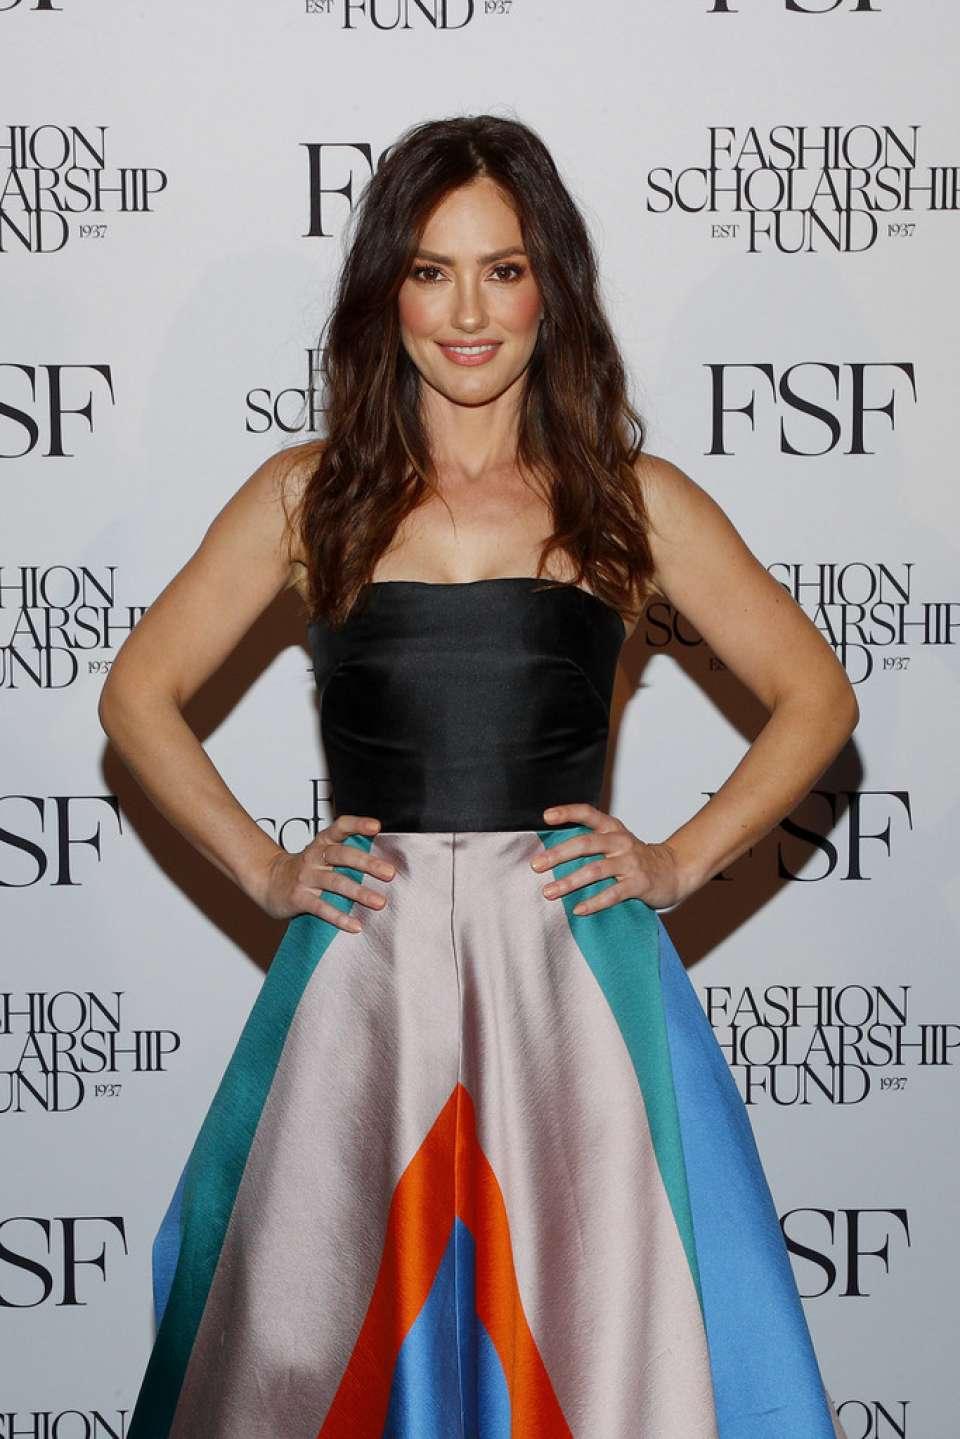 Minka Kelly - The Fashion Scholarship Fund Gala in NYC